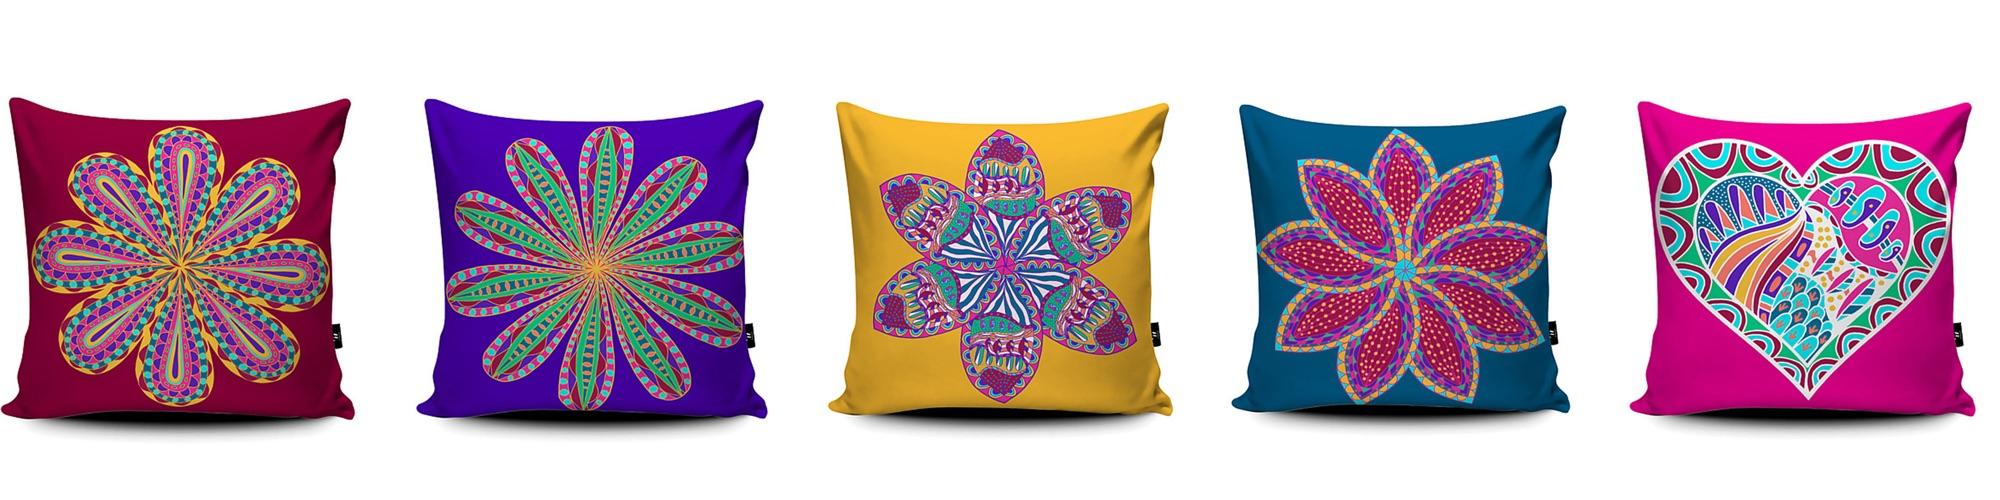 wraptious-cushions